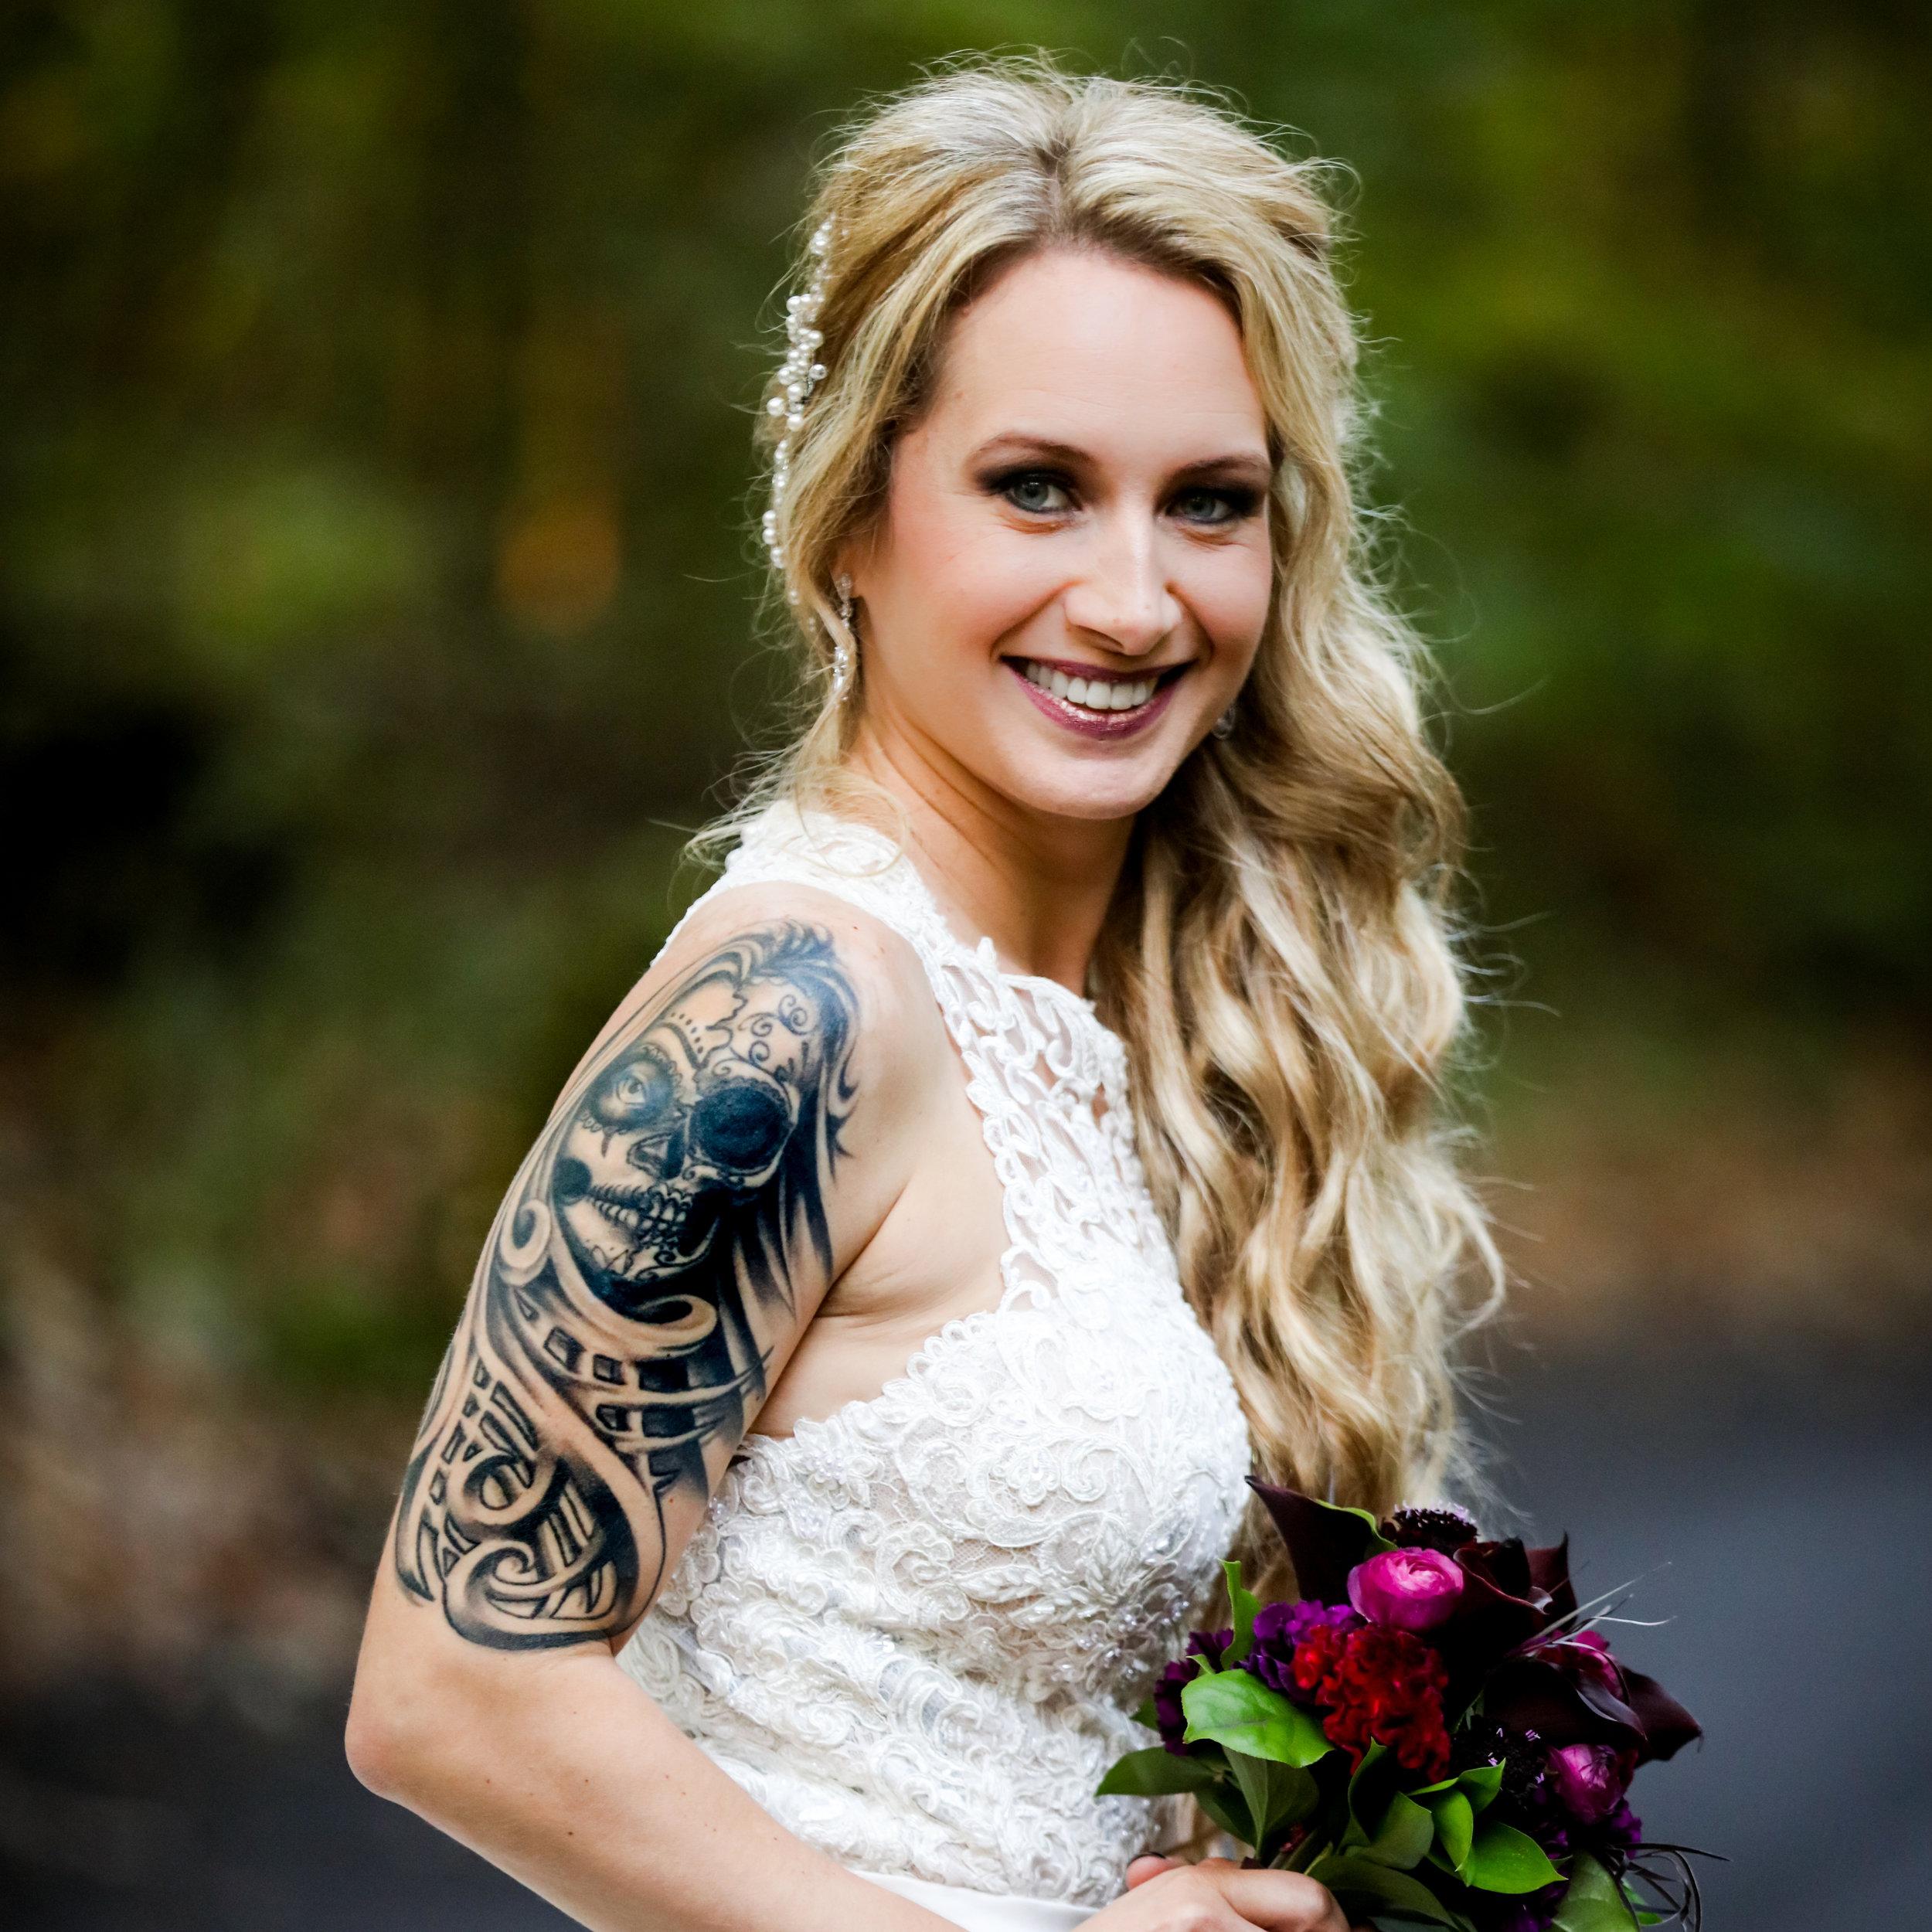 WeddingWebsite-94.jpg